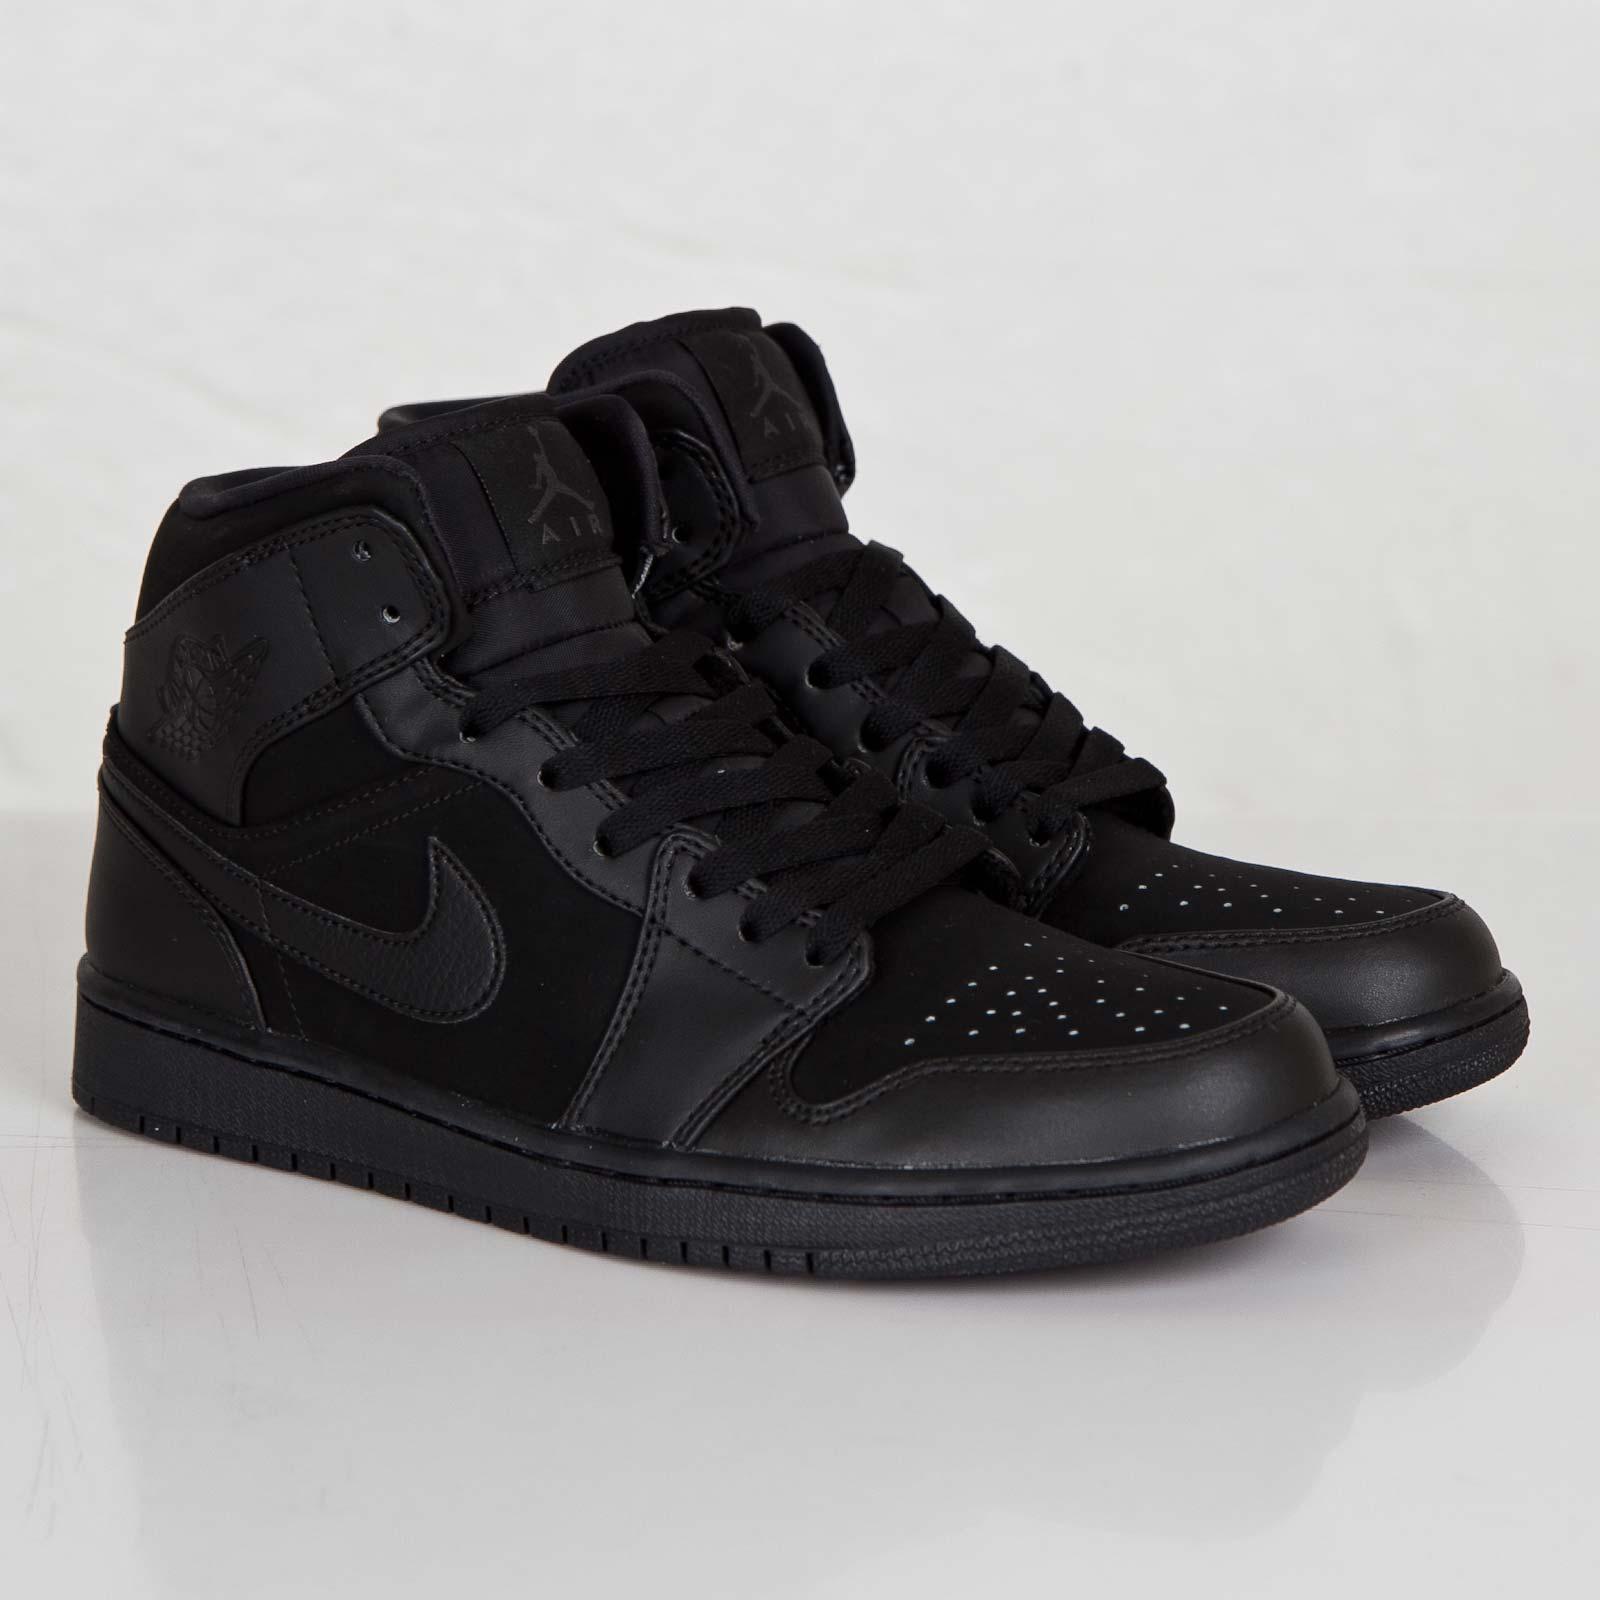 f0863b302ff3dc Jordan Brand Air Jordan 1 Mid - 554724-011 - Sneakersnstuff ...